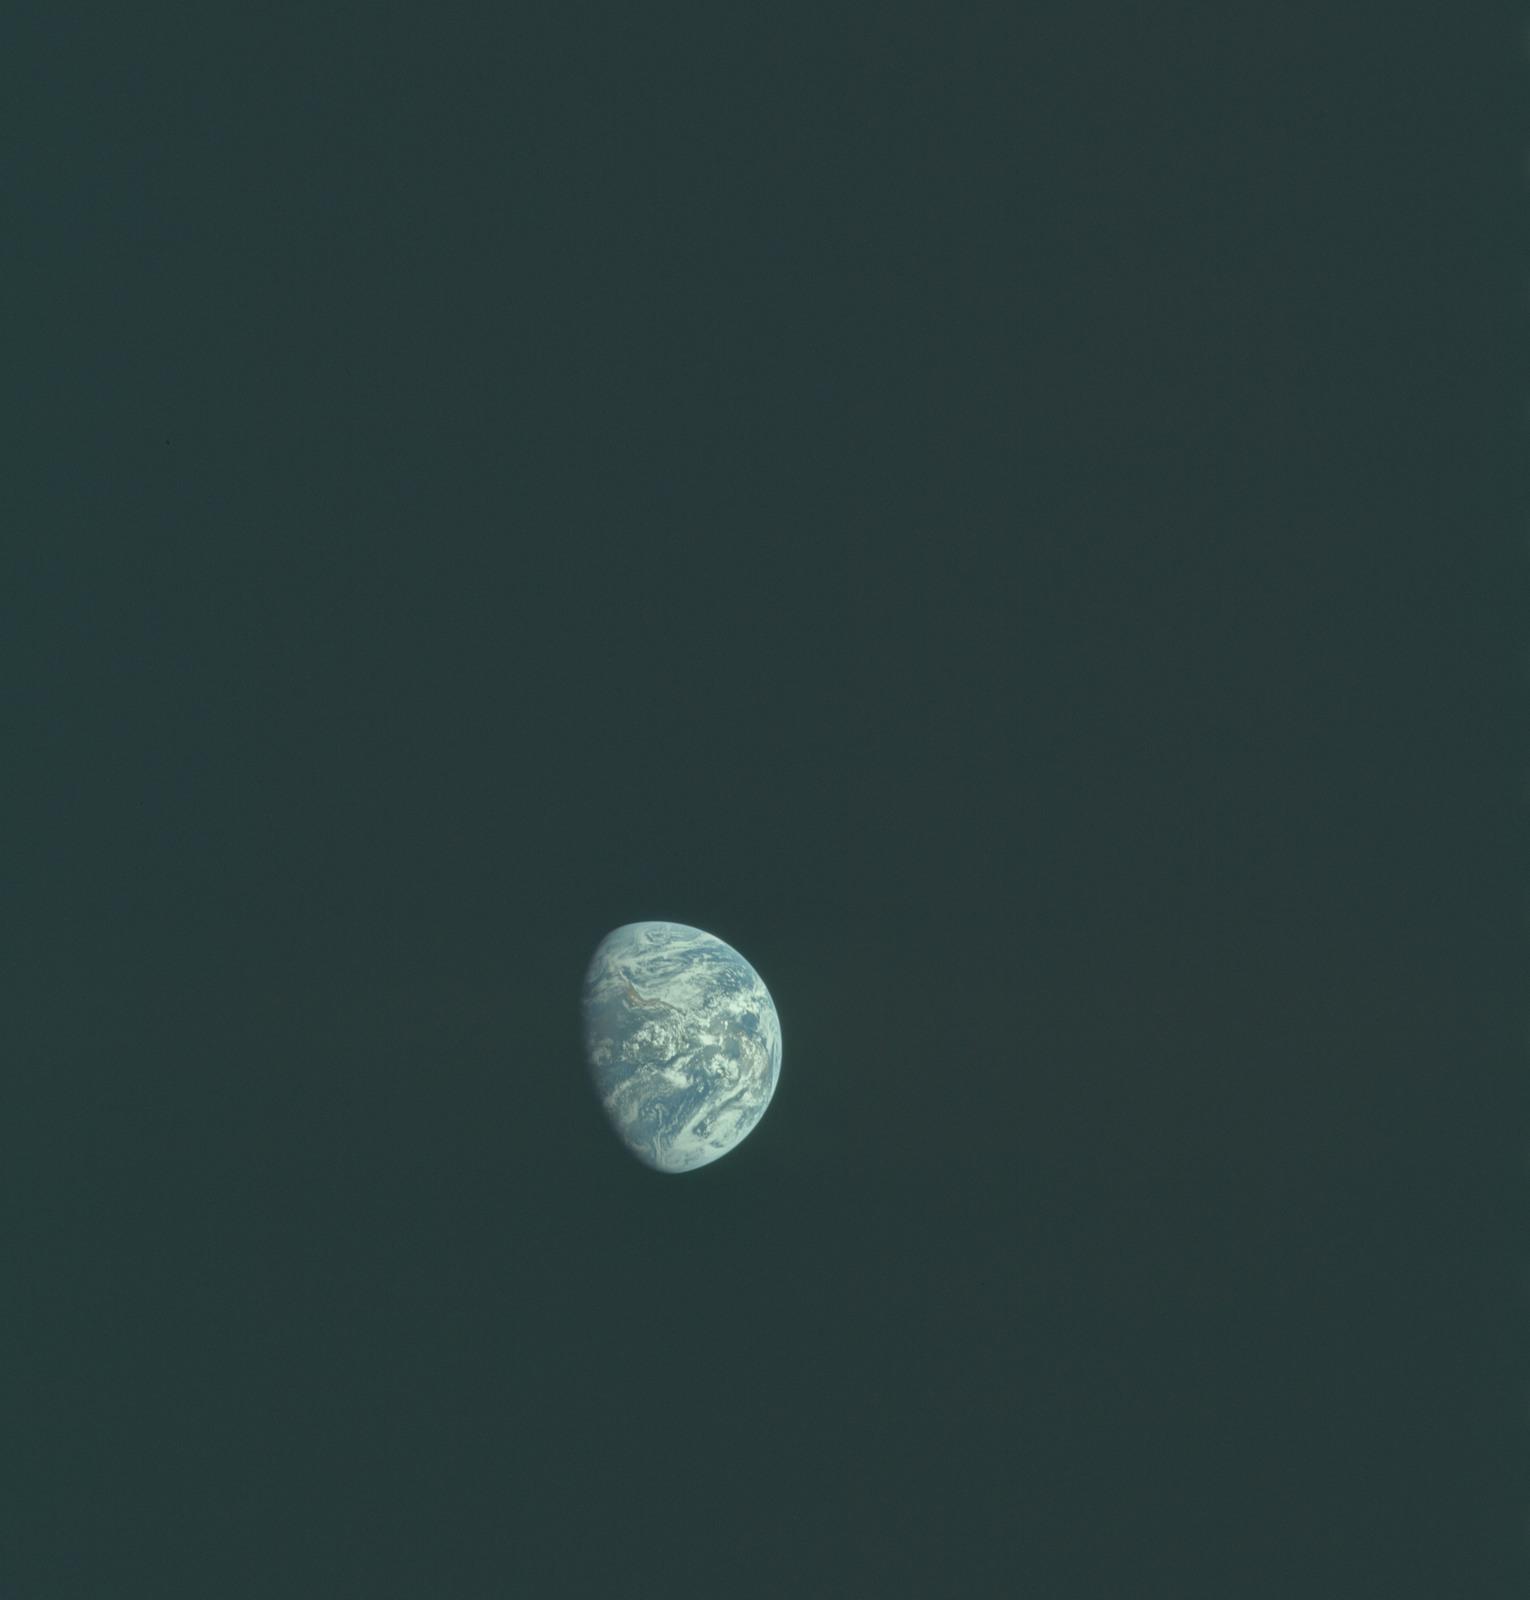 AS11-36-5380 - Apollo 11 - Apollo 11 Mission image - Earth view over North and South America